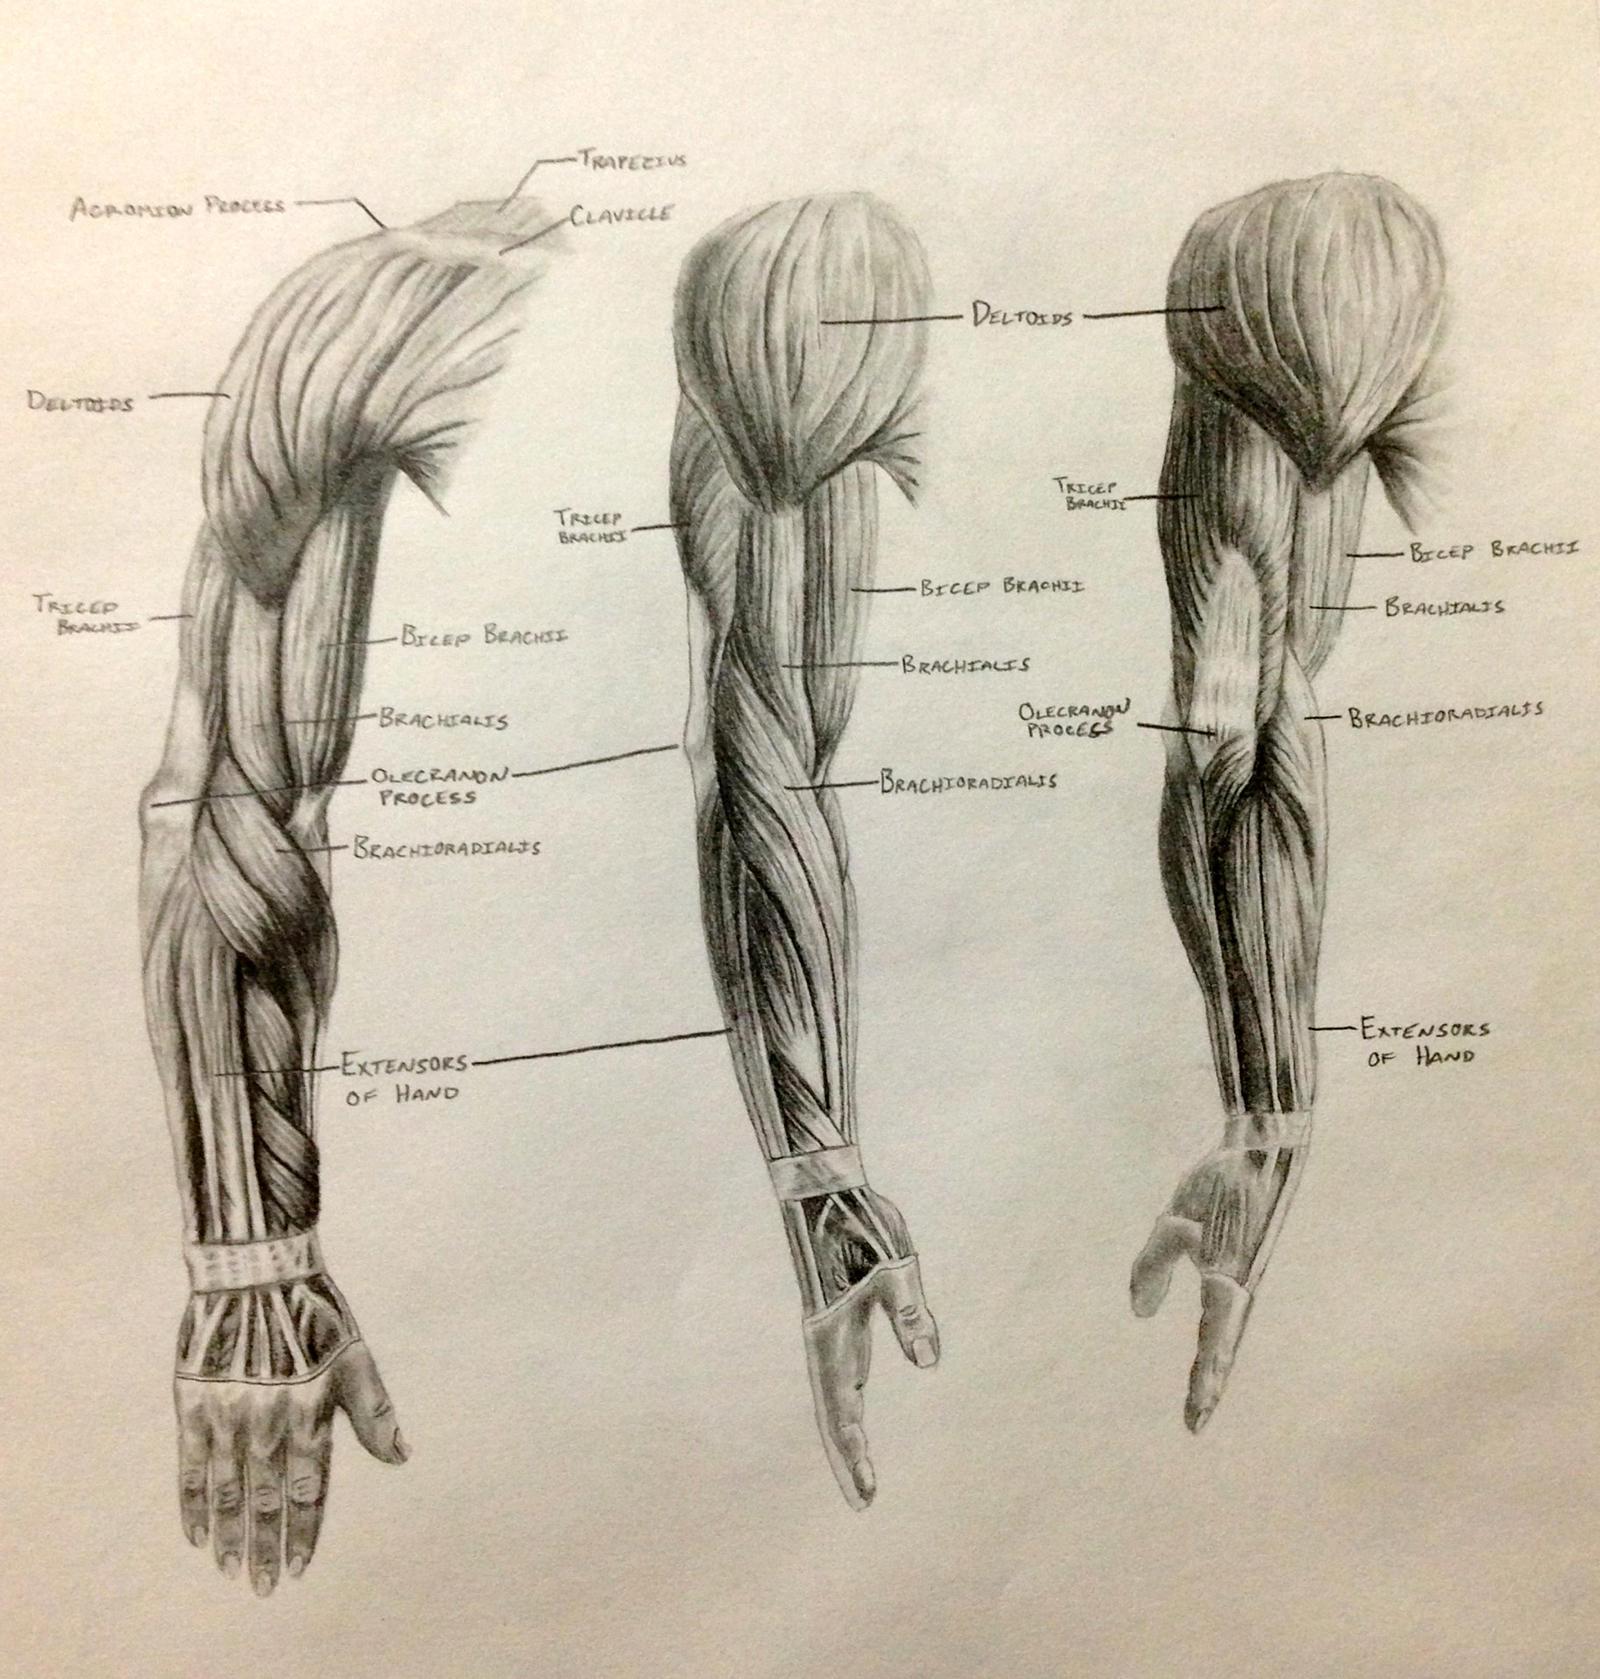 Human arm diagram - photo#43